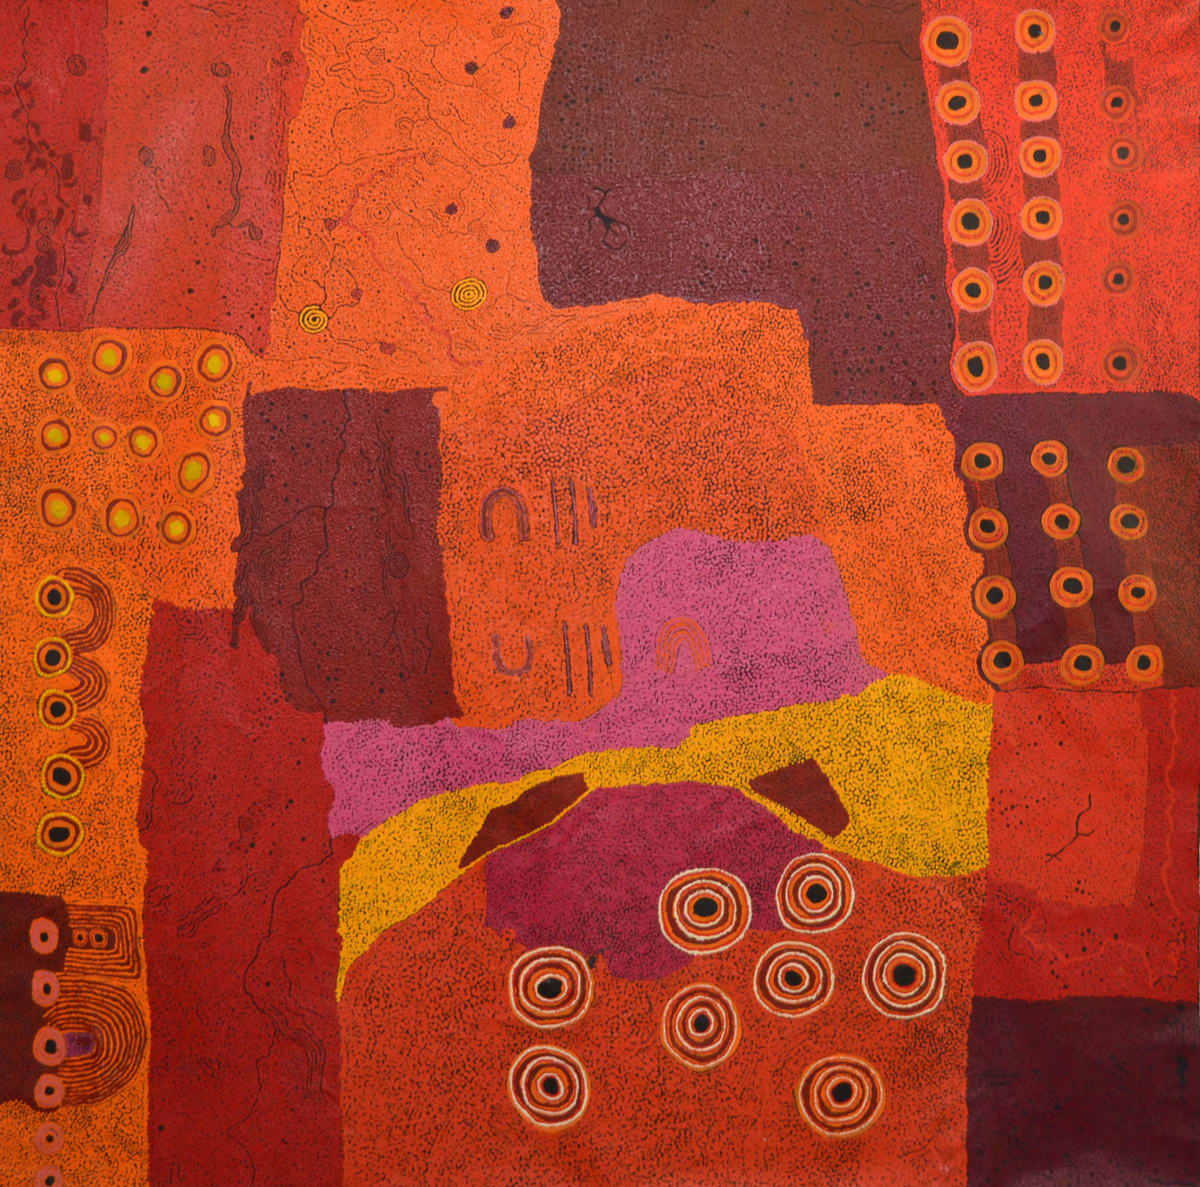 Keith Stevens and Ginger Wikilyiri Piltati/ Ilpin/ Wati Ngantaka 2014 acrylic on linen 200 x 200 cm